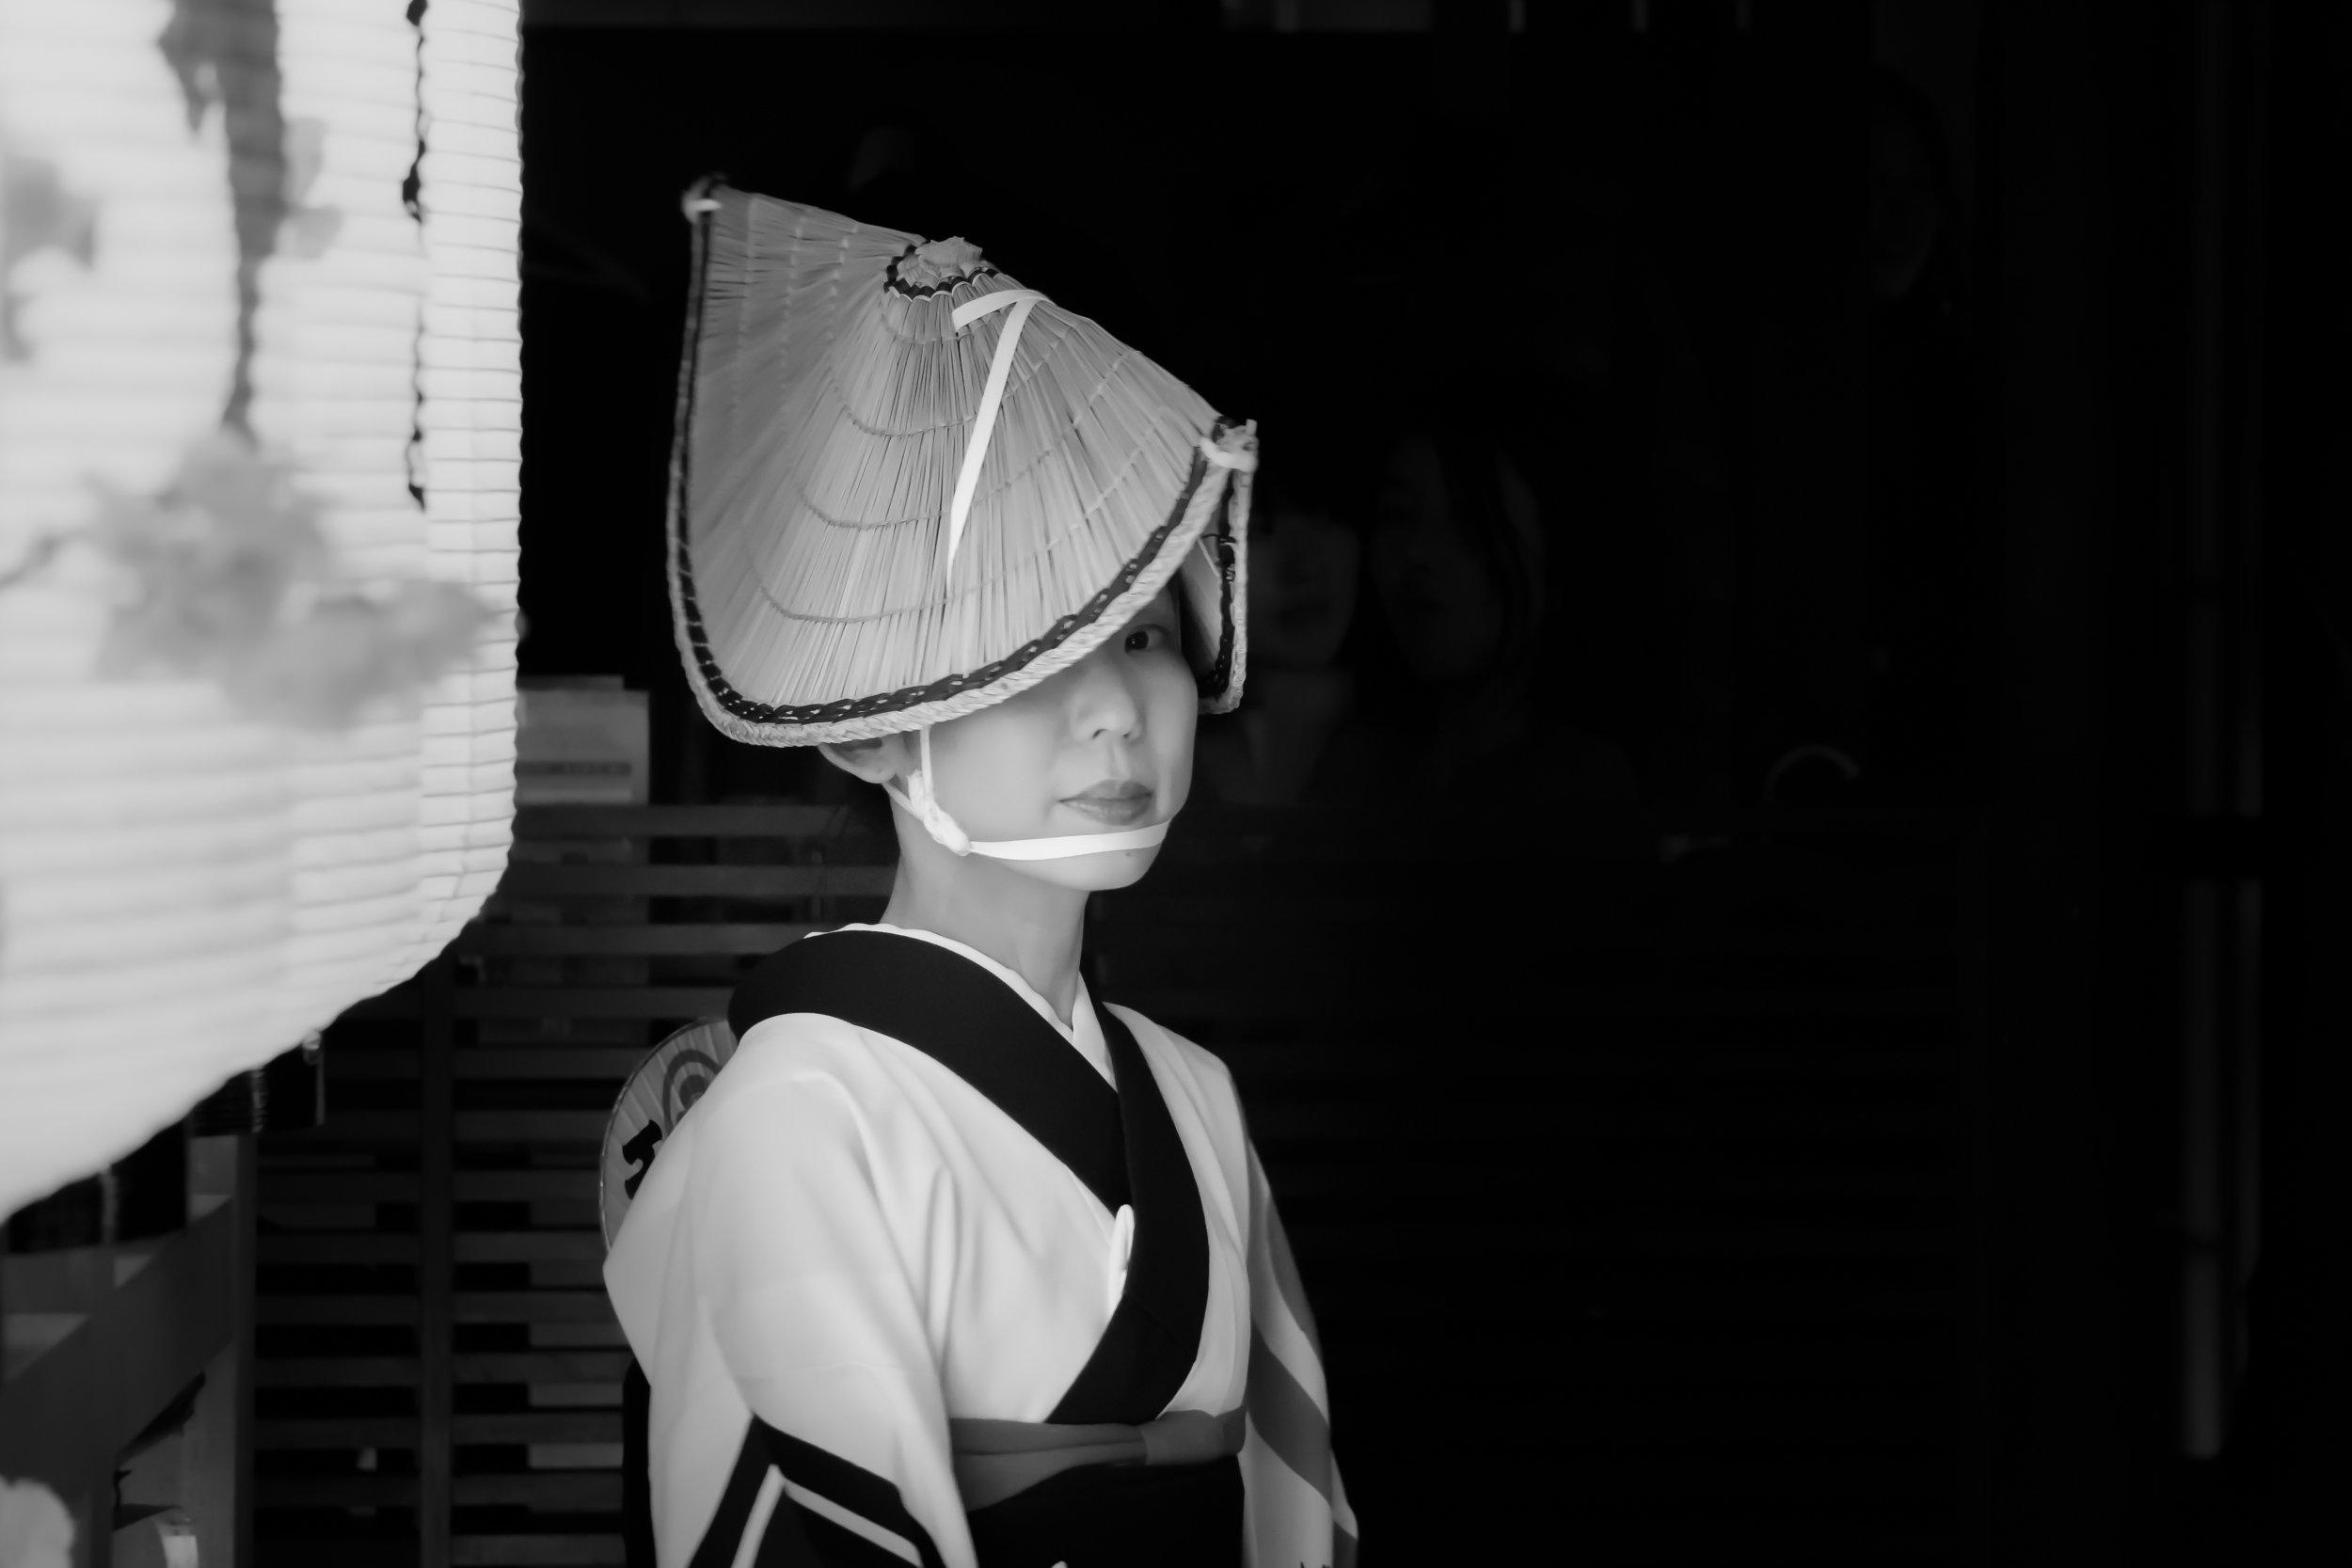 PHOTOGRAPHY: Andy Yee • Sony A6000 • E 55-210mm Ƒ/4.5-6.3 OSS @ 56MM • Ƒ/4.5 • 1/30• ISO 3200